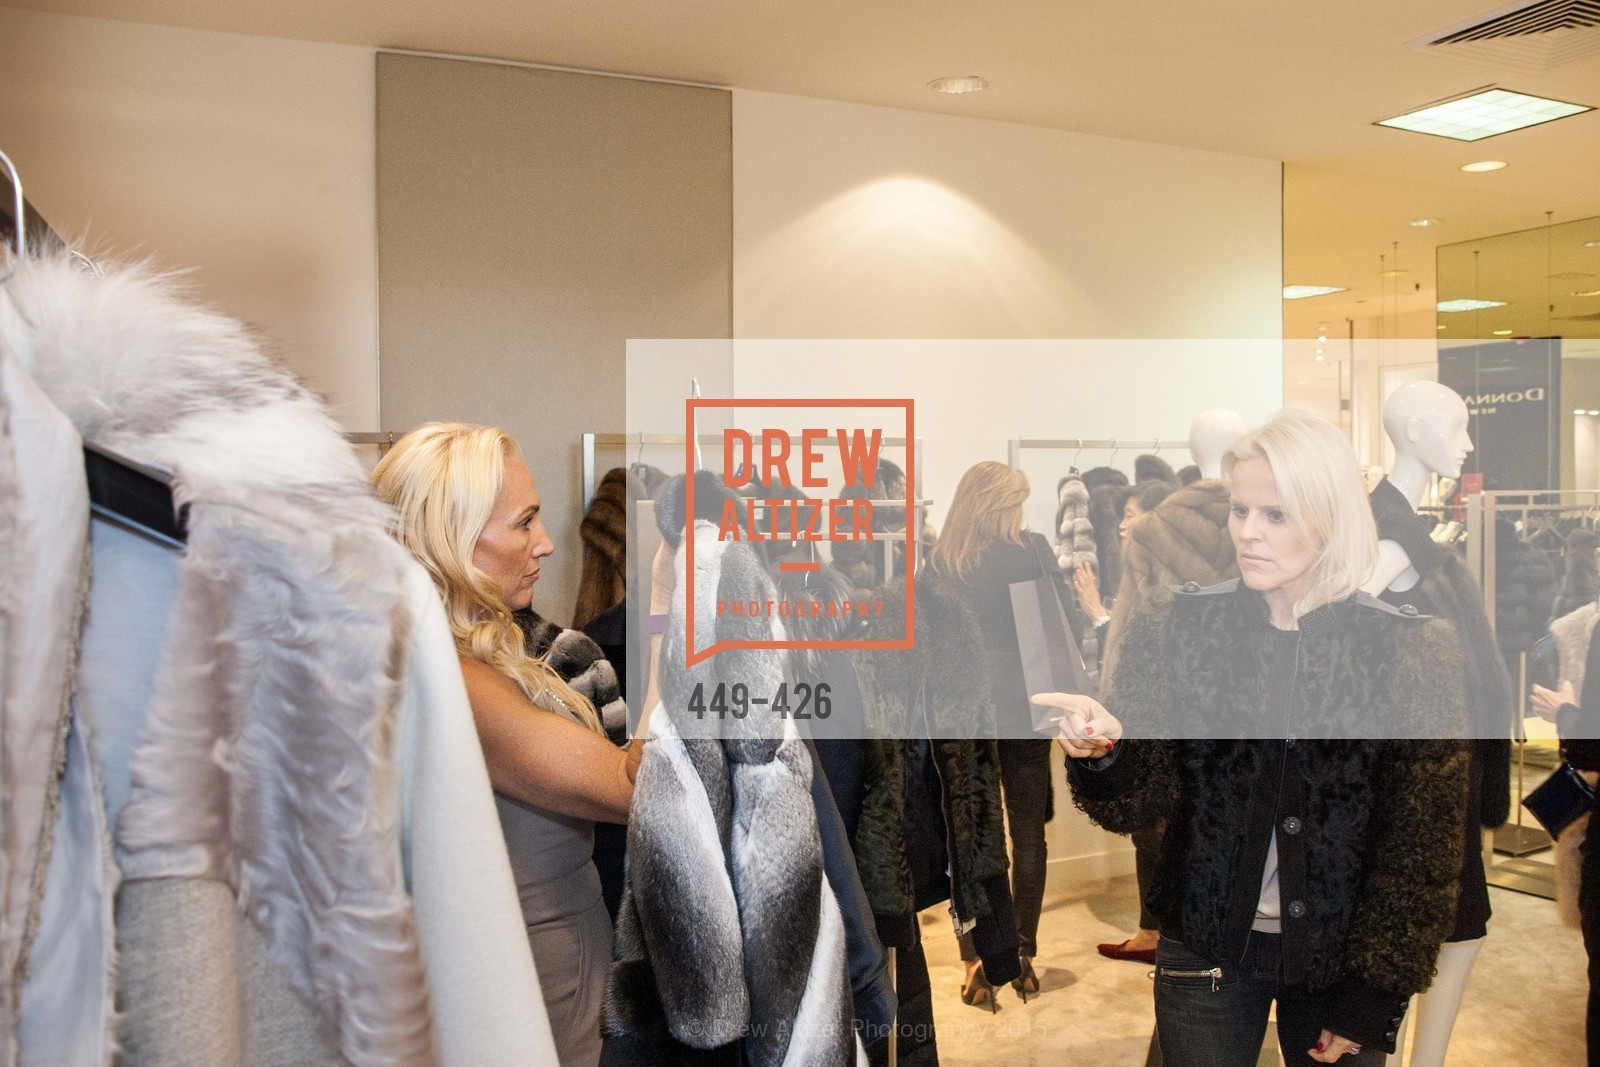 Katja O'Brien, Rindi at Saks Fur Salon, Saks Fifth Avenue, Fur Salon, October 29th, 2015,Drew Altizer, Drew Altizer Photography, full-service event agency, private events, San Francisco photographer, photographer California